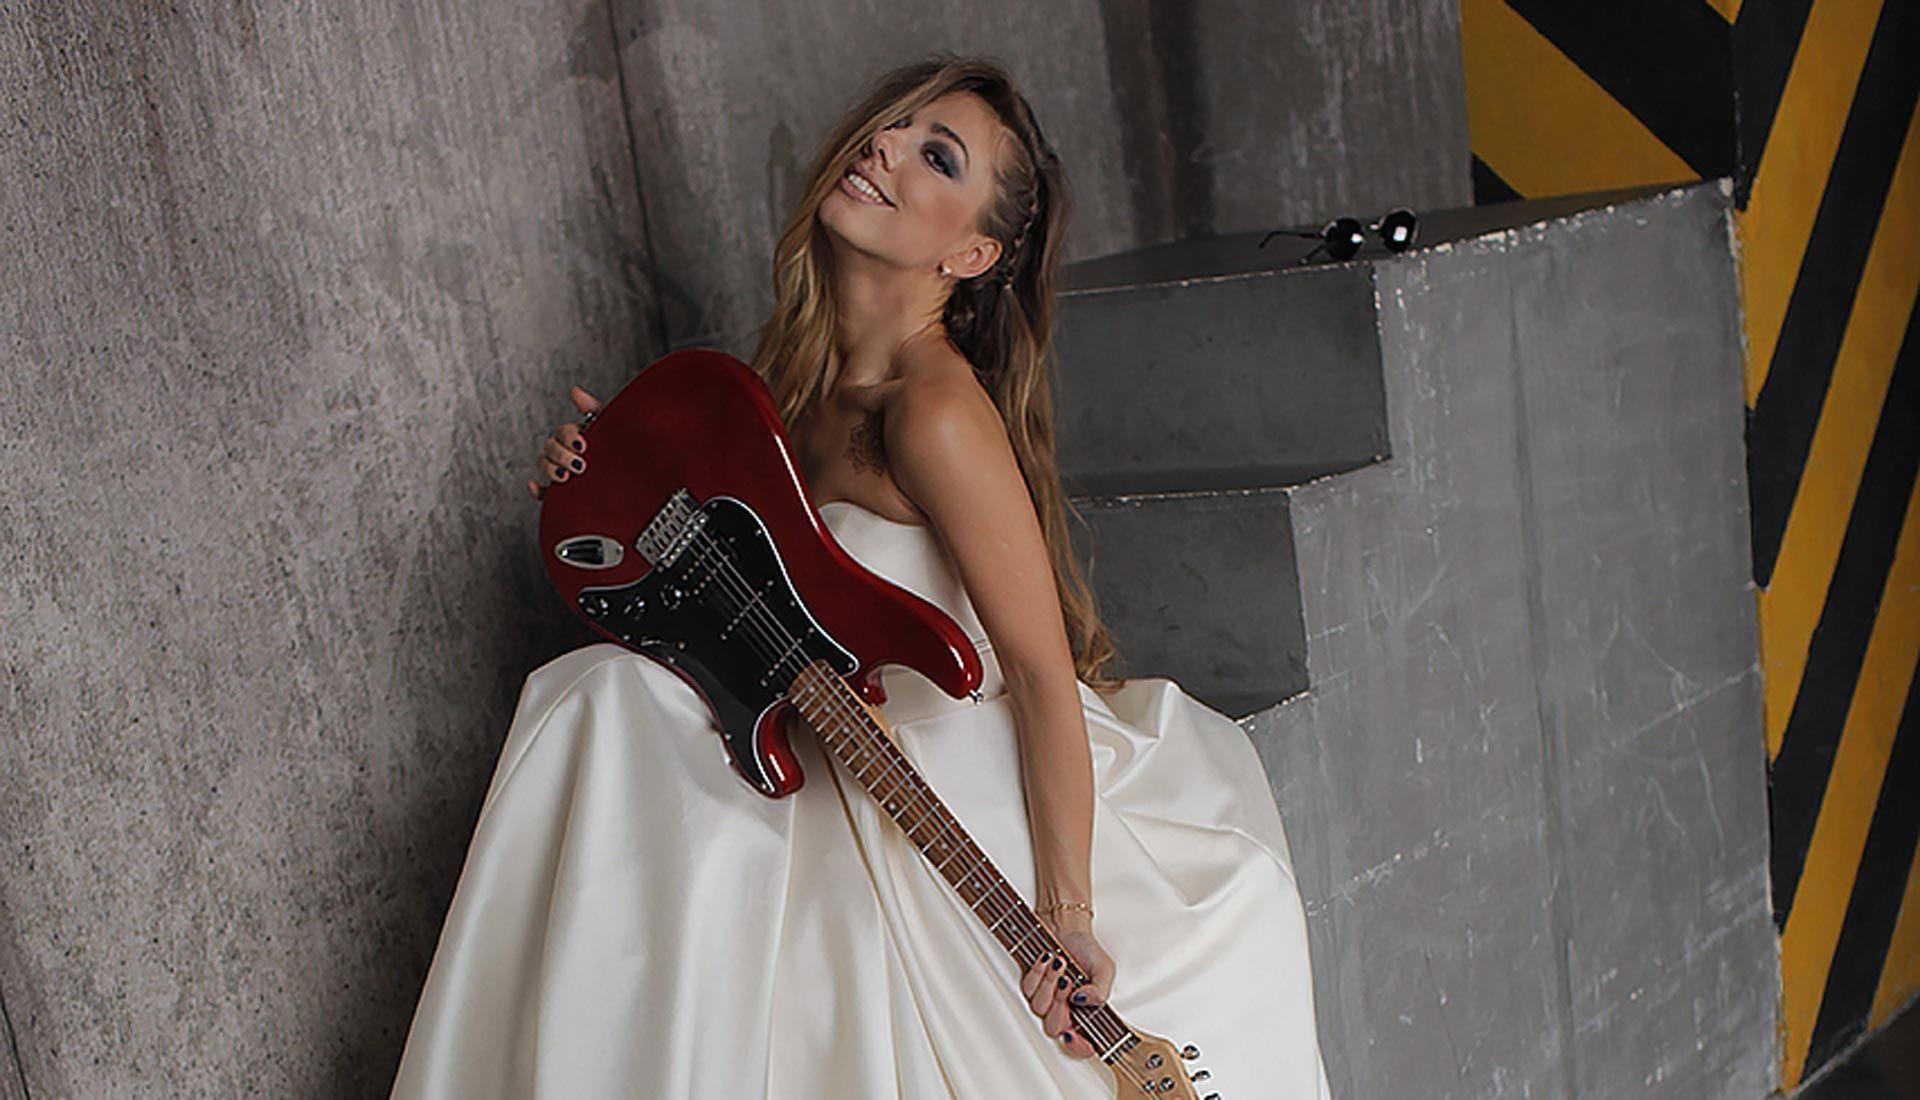 Мария Перминова. Рок-звезда